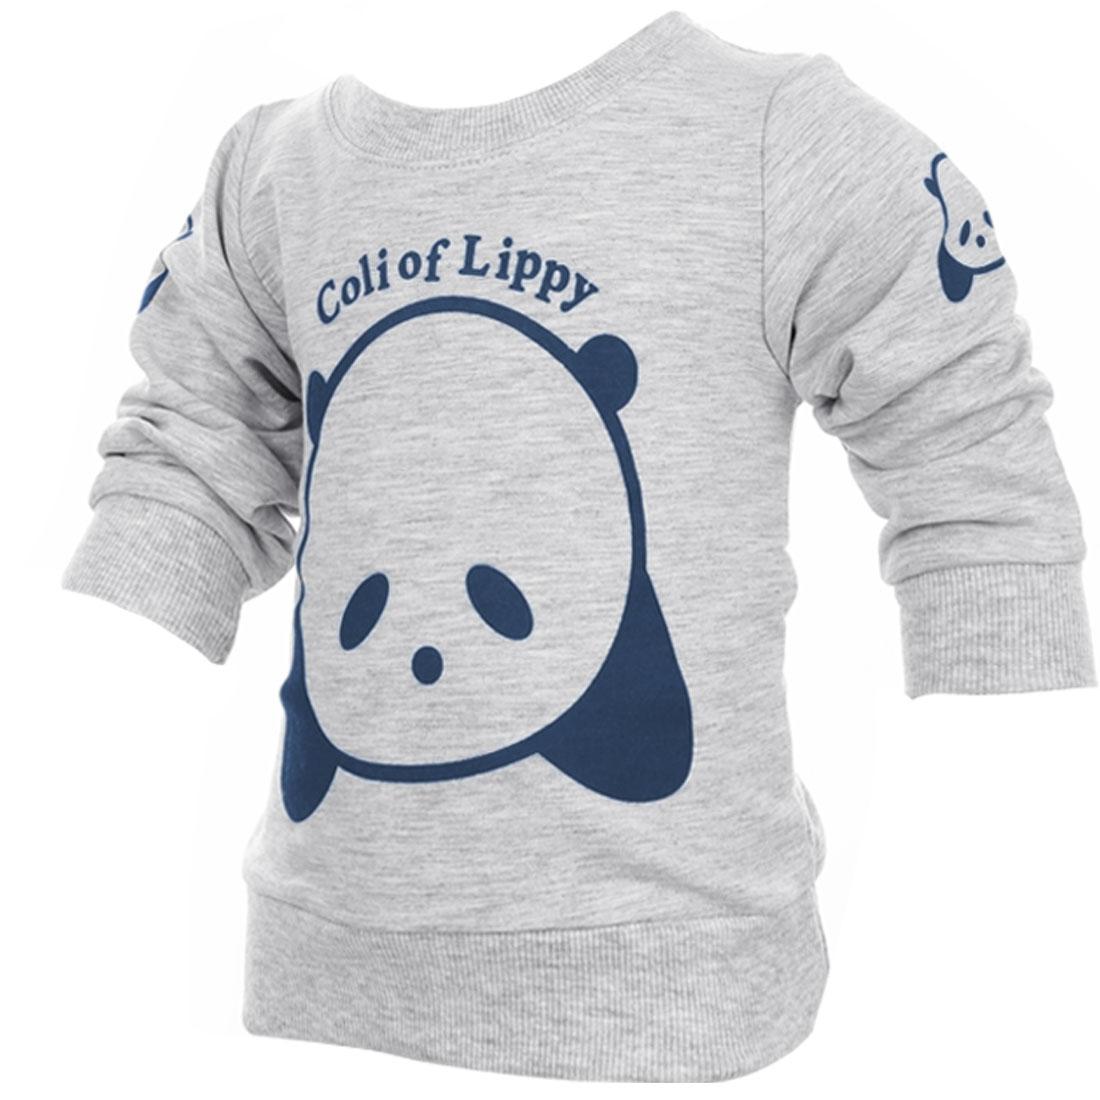 Kids Fashion NEW Round Neck Sweatshirt Light Gray 4T